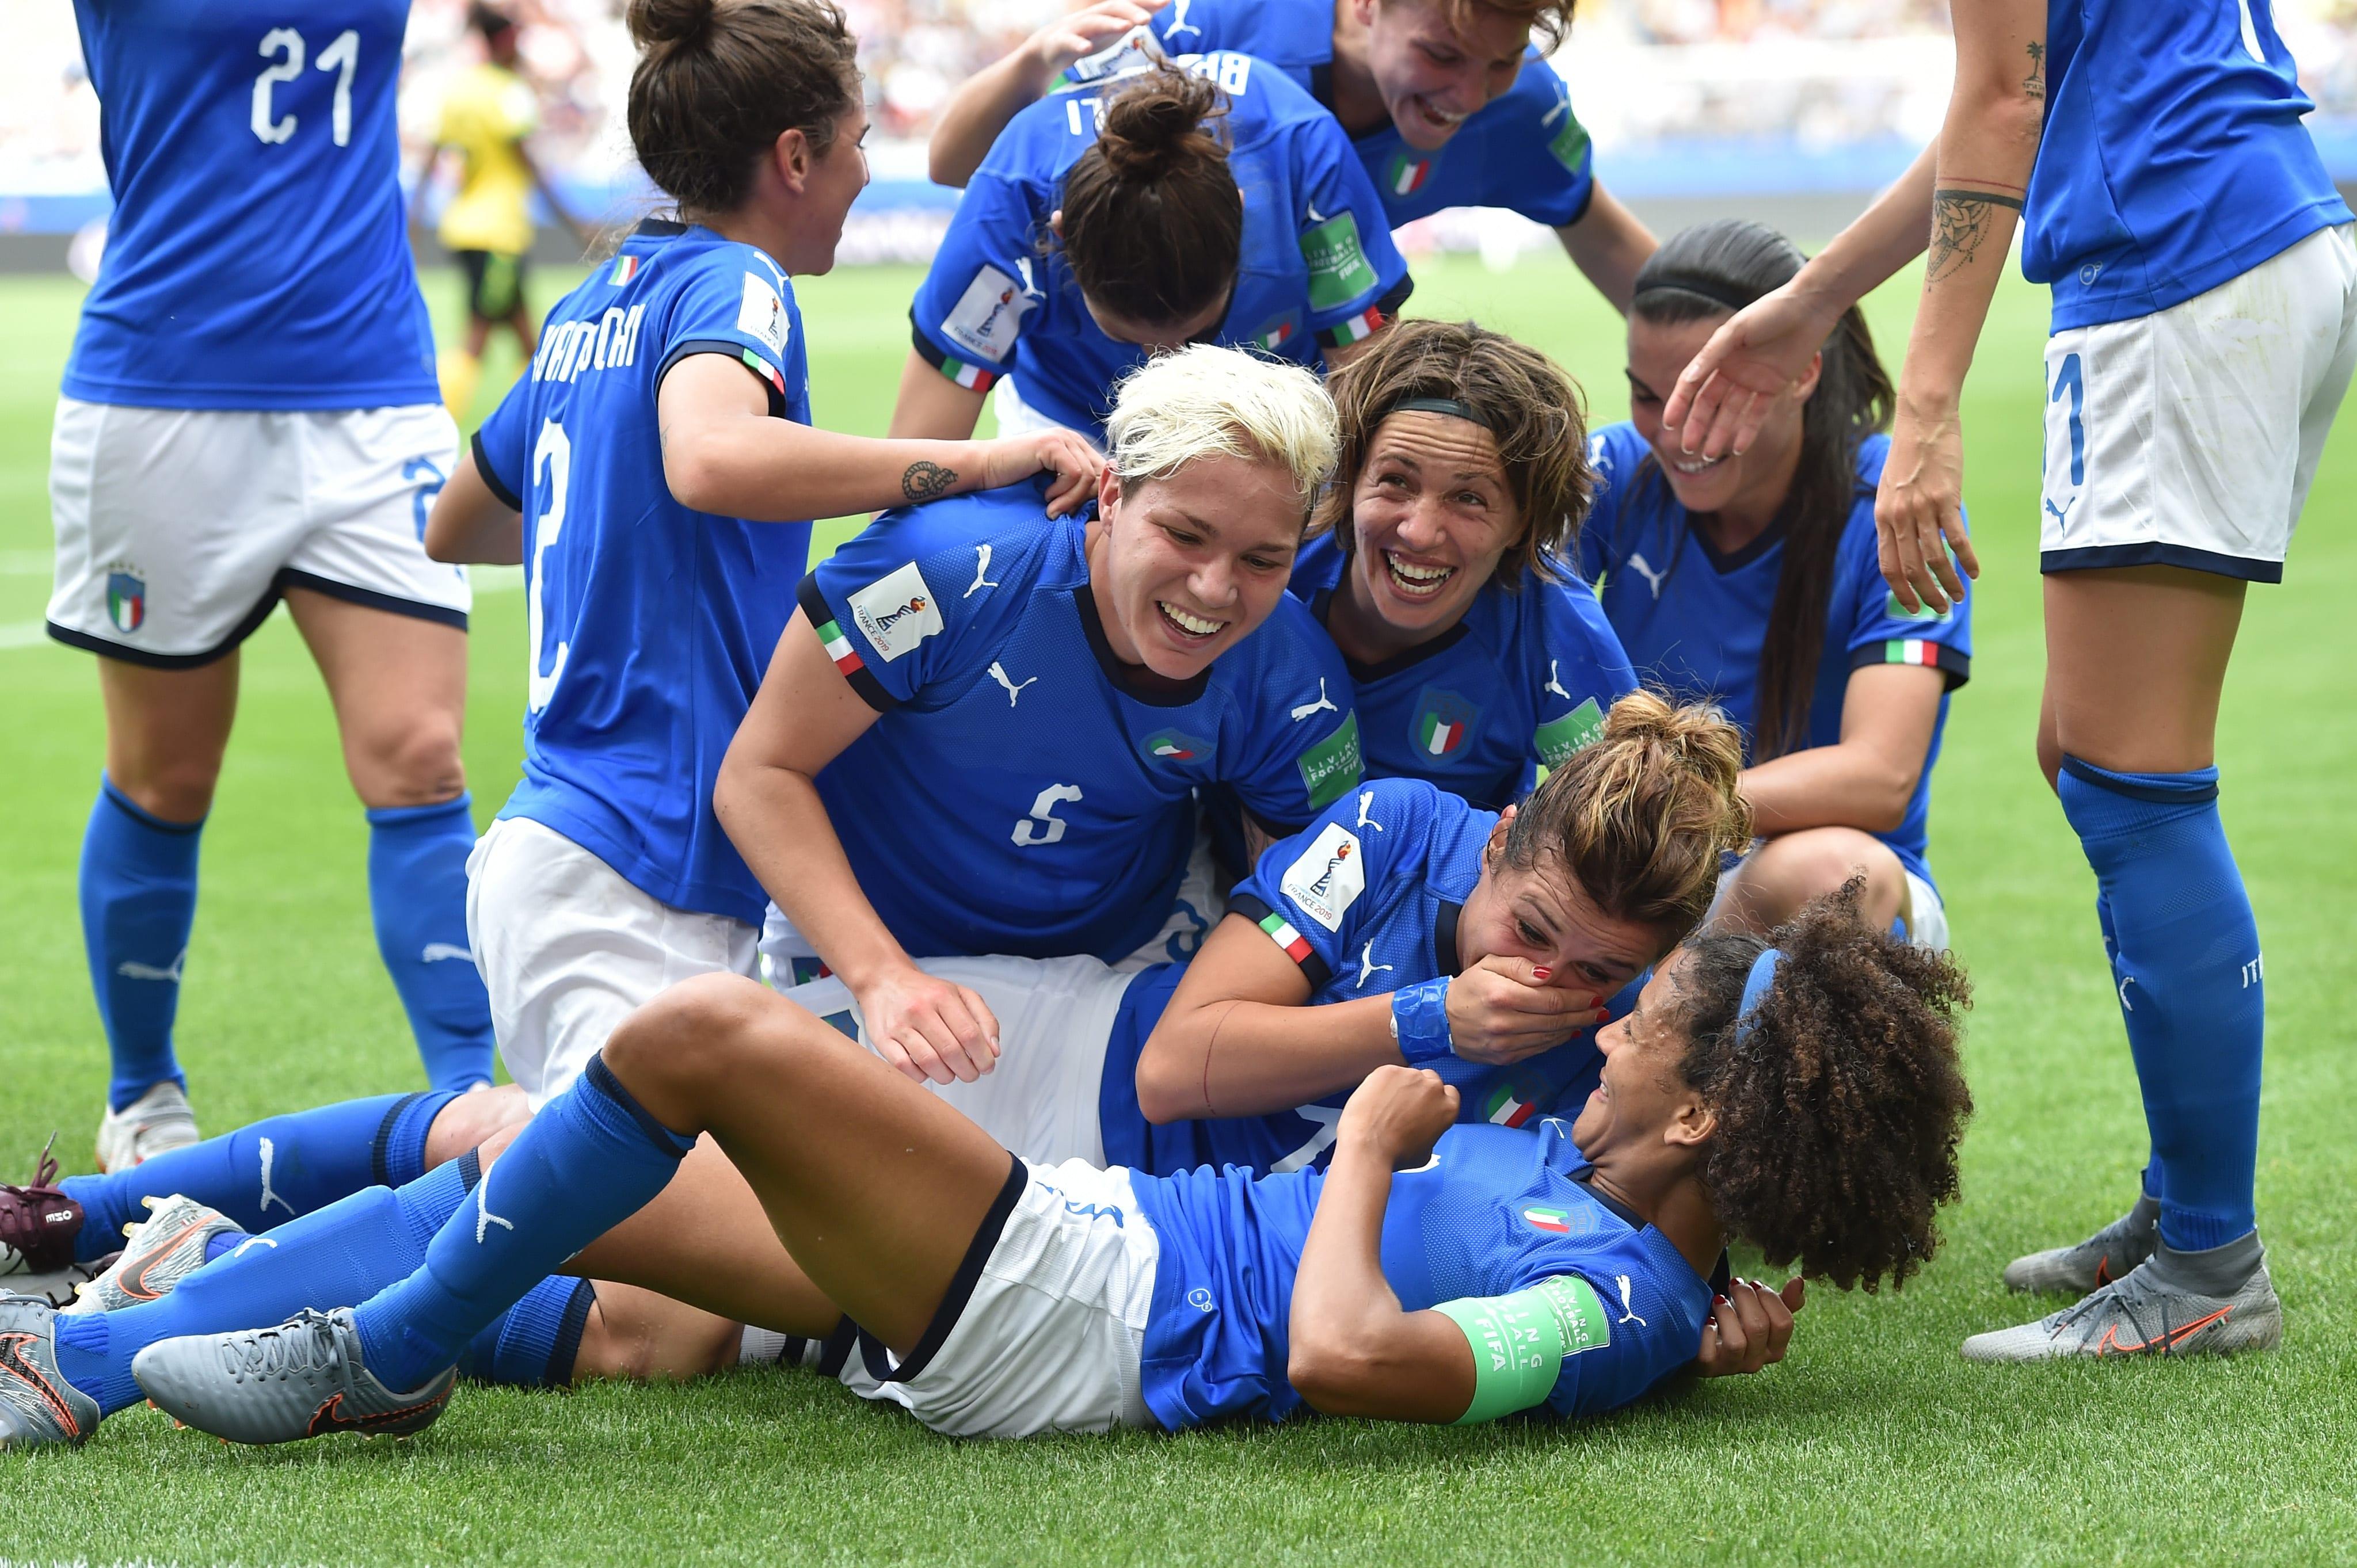 Itália goleia grupo Brasil Copa do Mundo Feminina